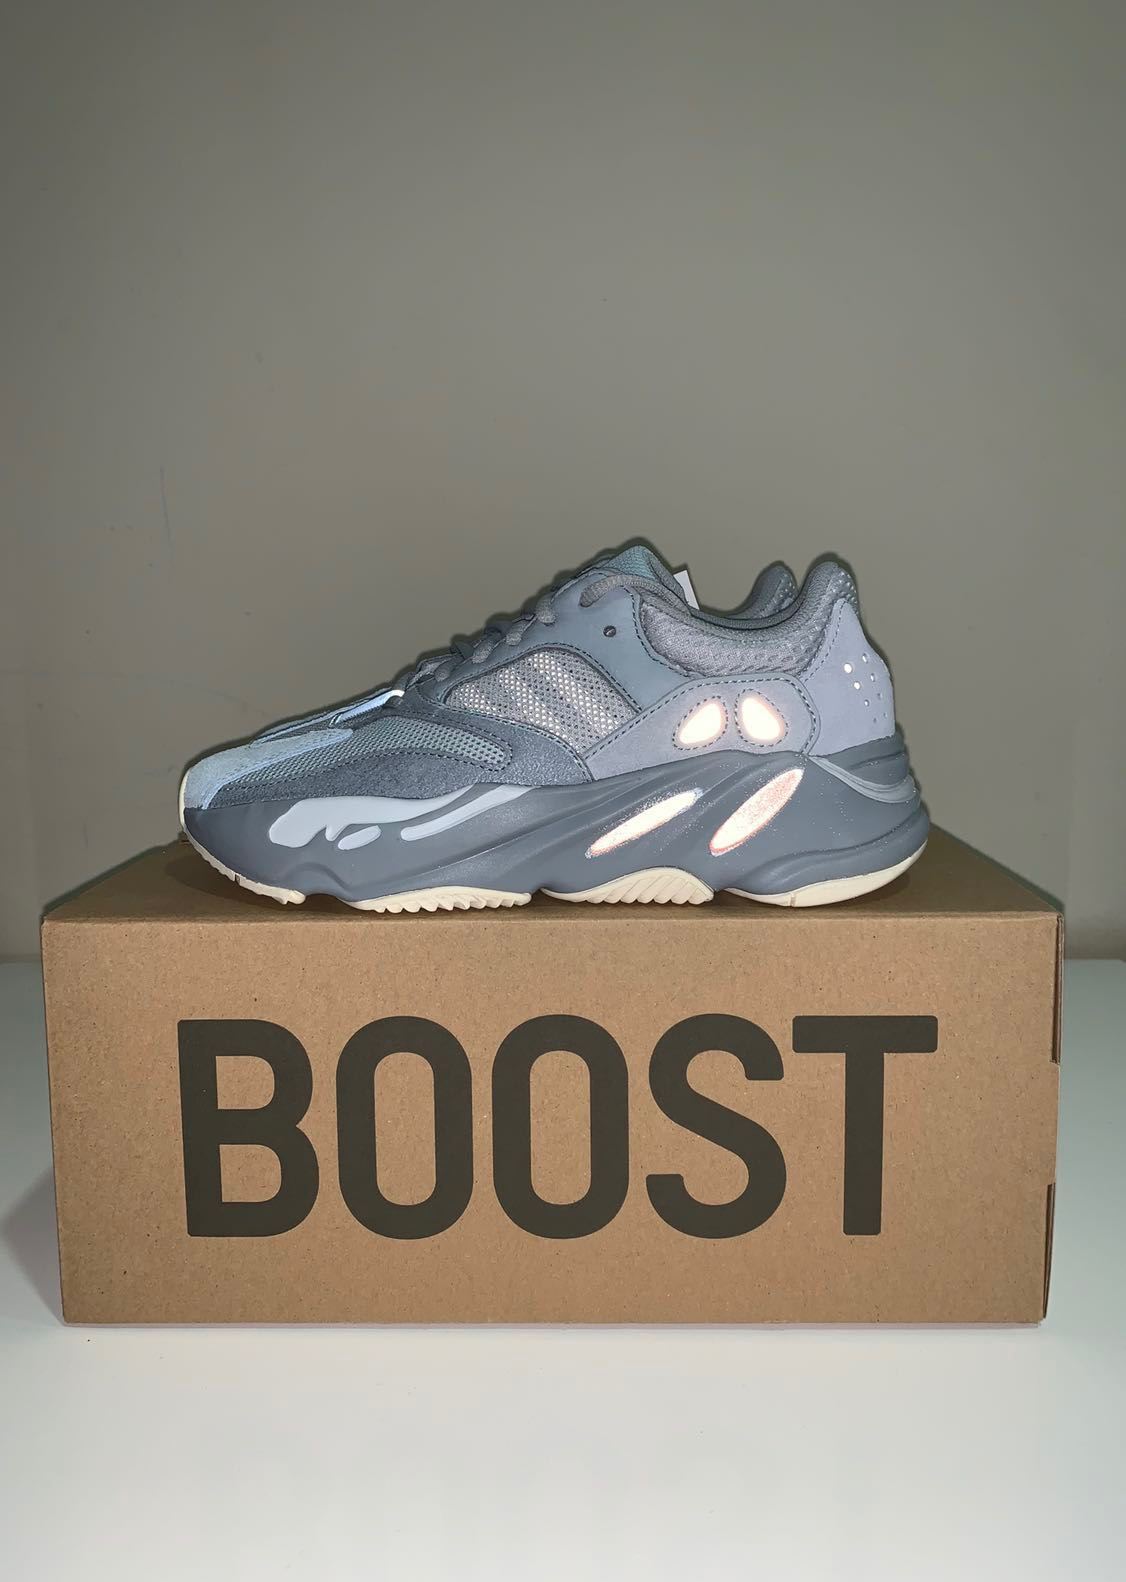 21cee6fc43c UK4.5 adidas Yeezy Boost 700 Inertia